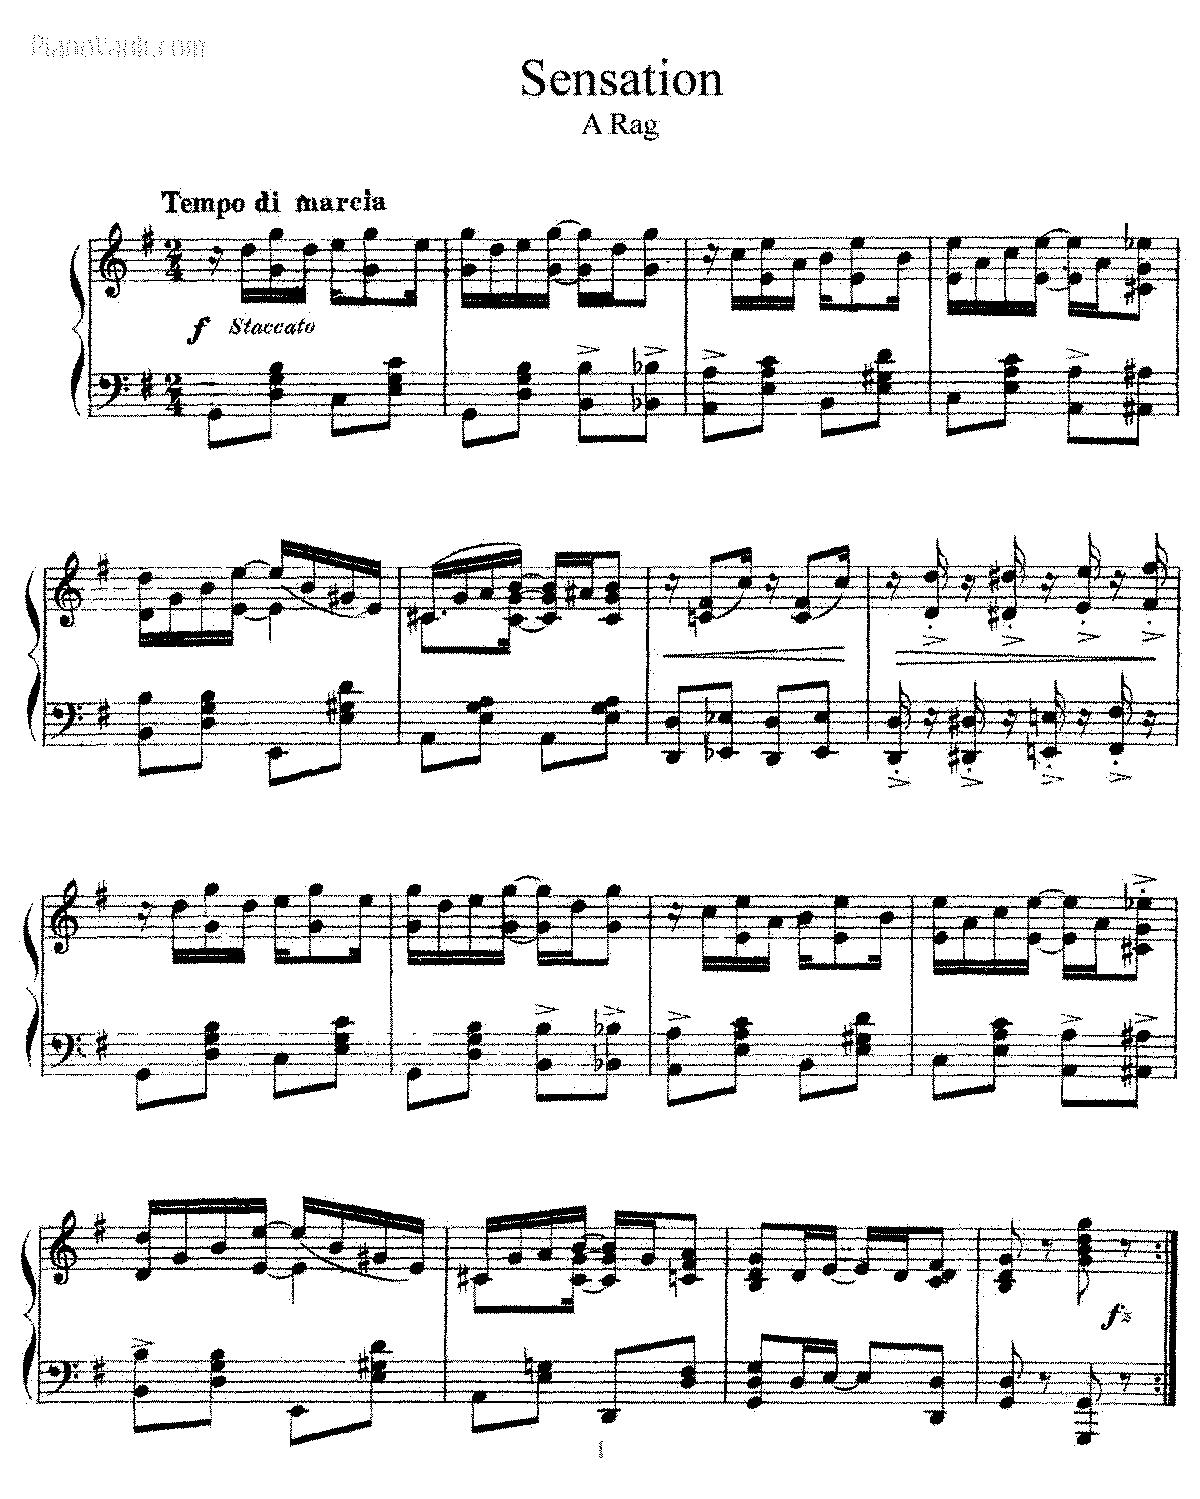 Free Sheet Music Public Domain: Sensation (Lamb, Joseph Francis)